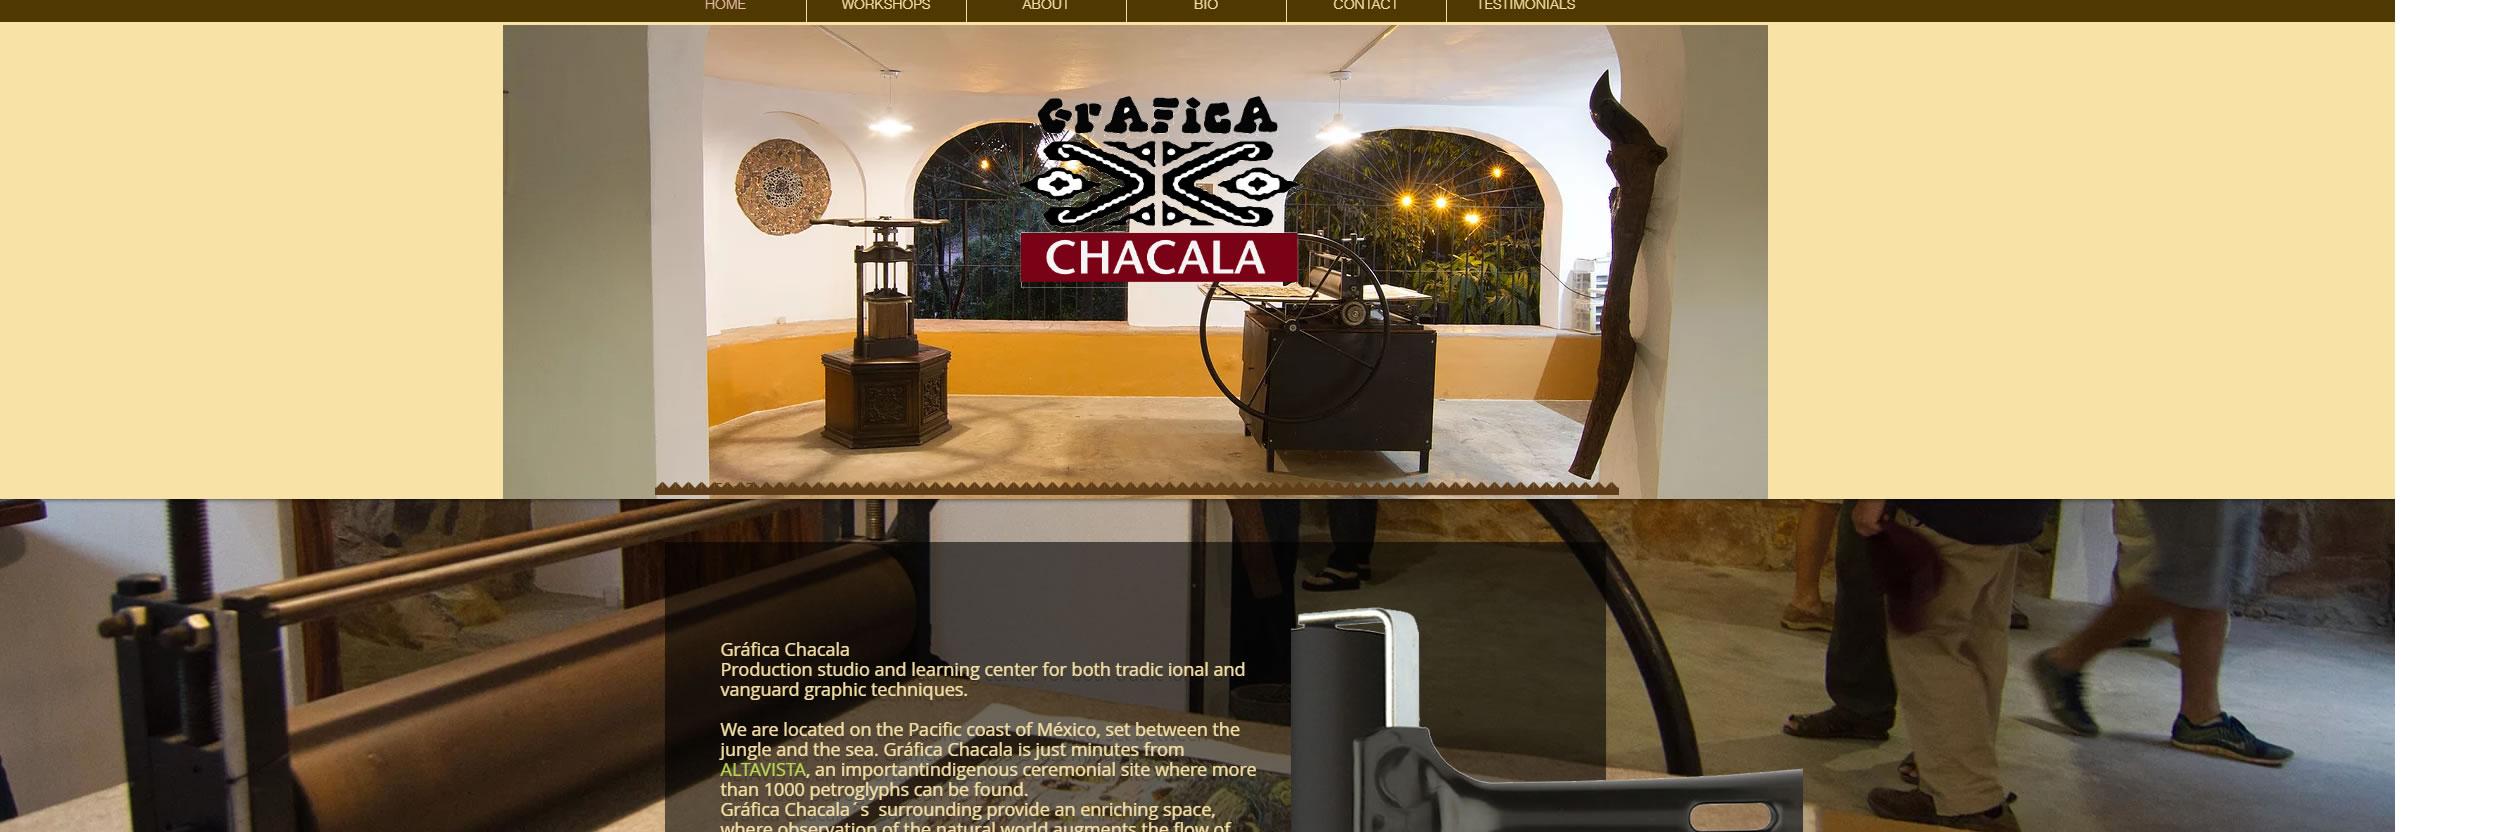 grafica_chacala_galeria_de_gravura